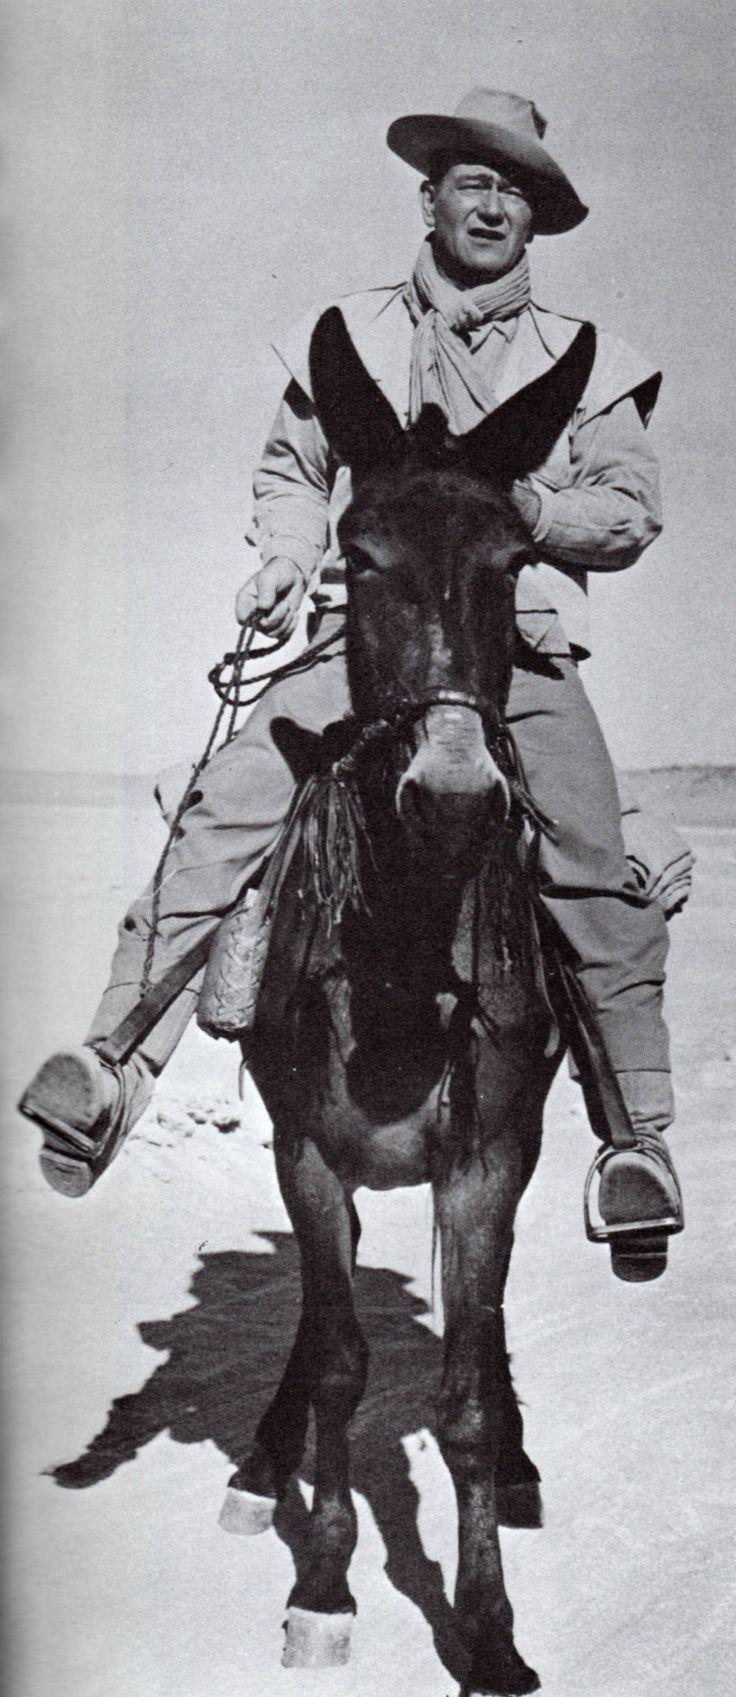 John Wayne - Legend of the Lost, 1957 Duke riding a mule